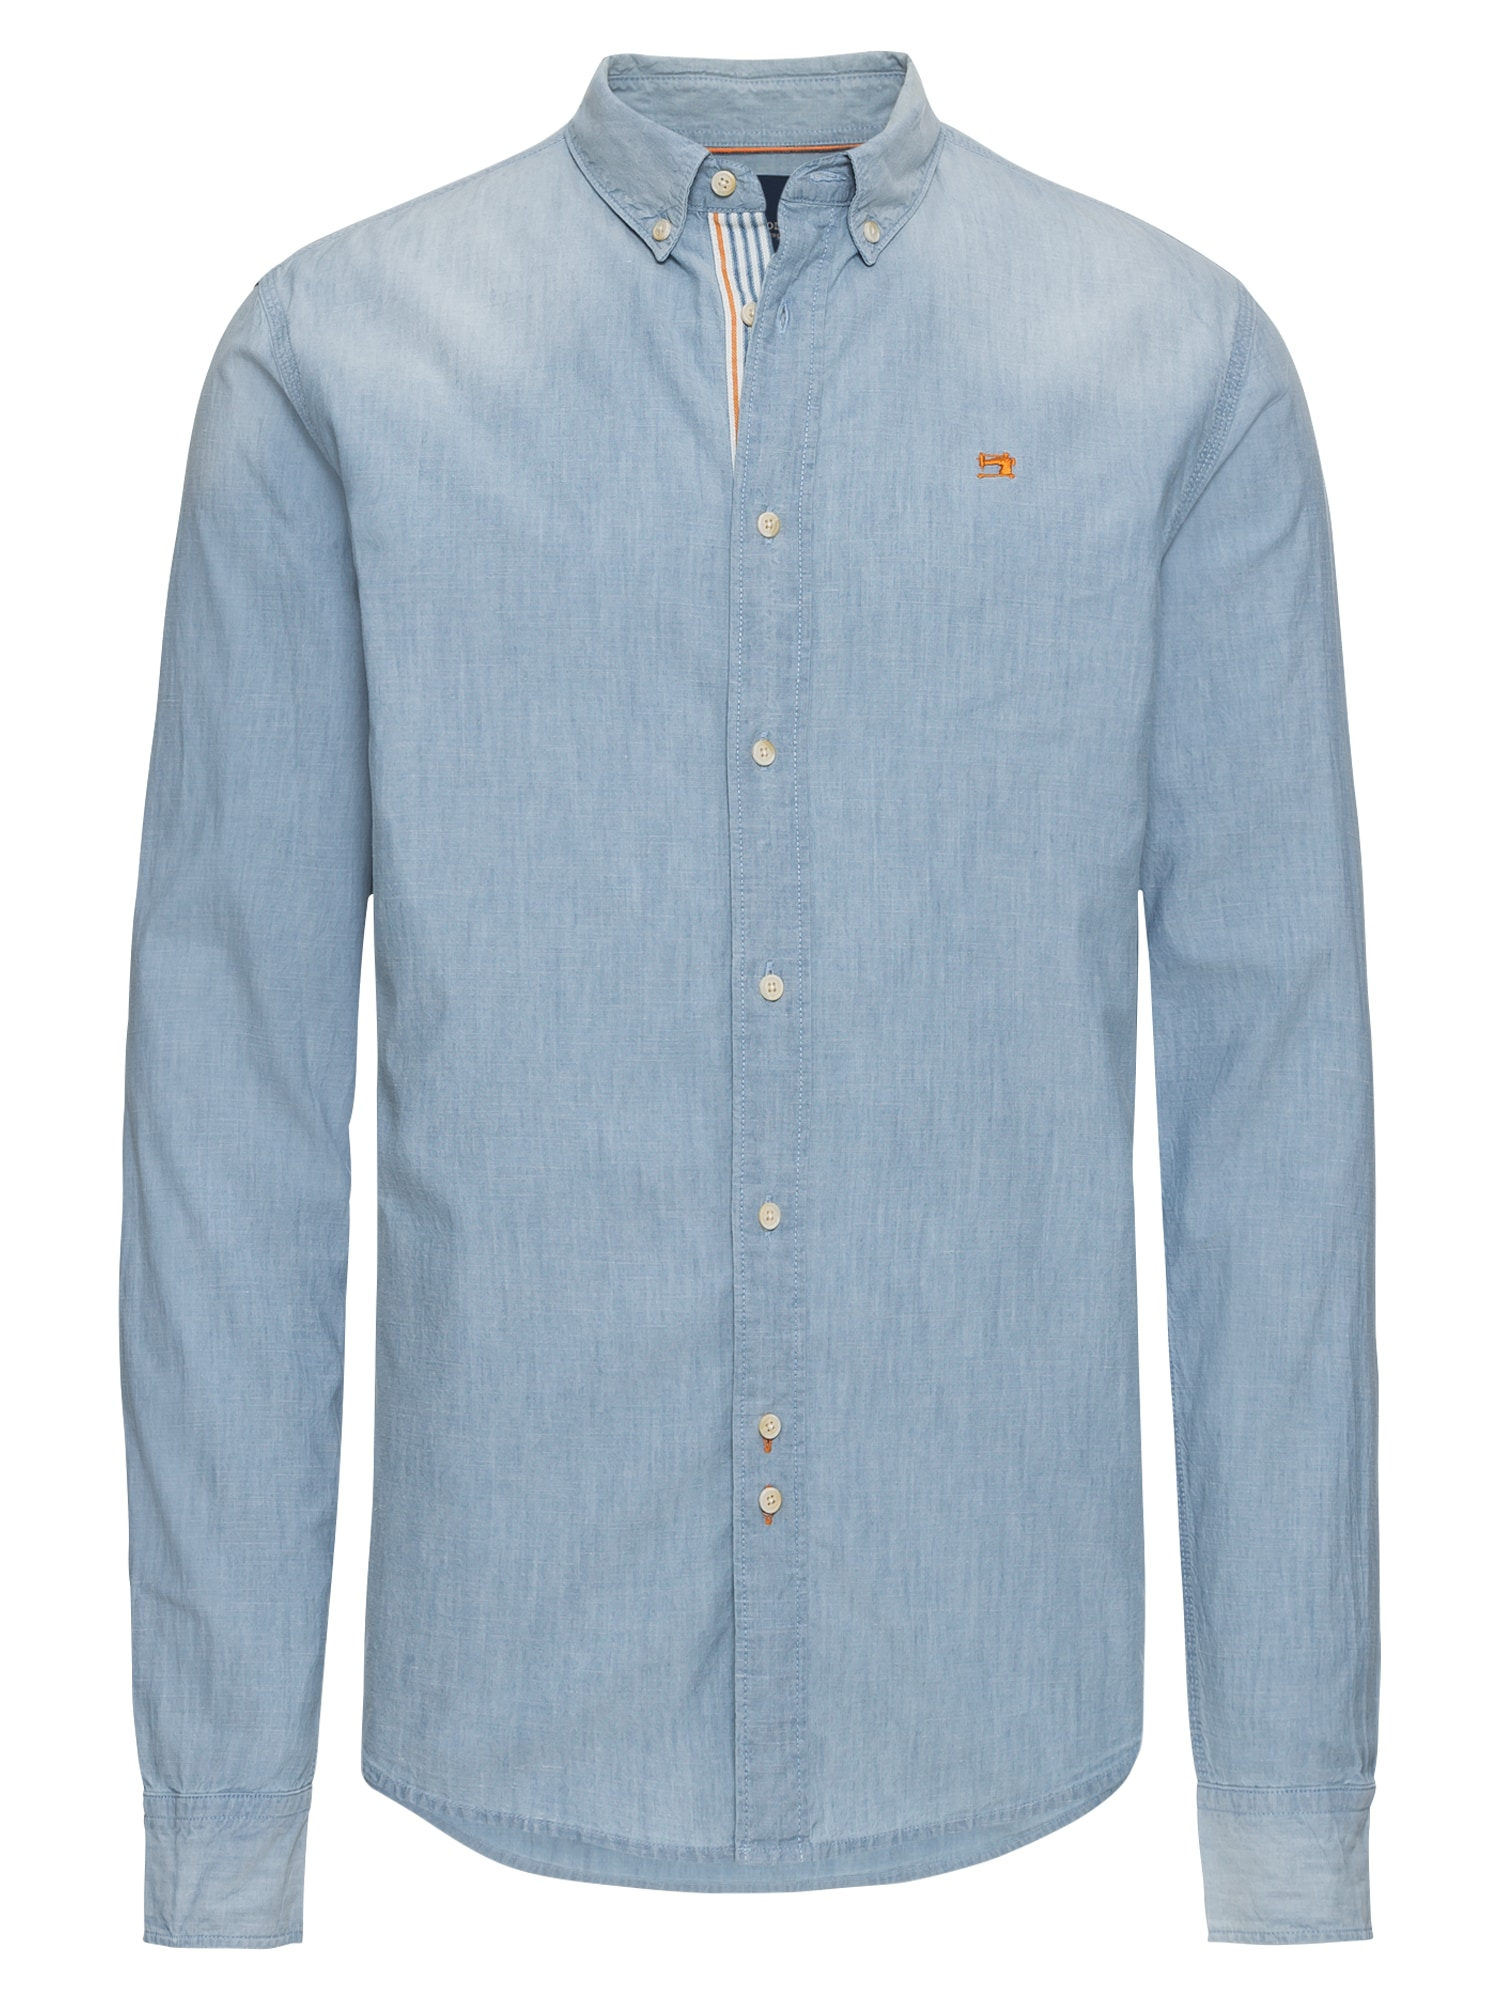 SCOTCH  and  SODA Heren Overhemd REGULAR FIT Chambray shirt lichtblauw